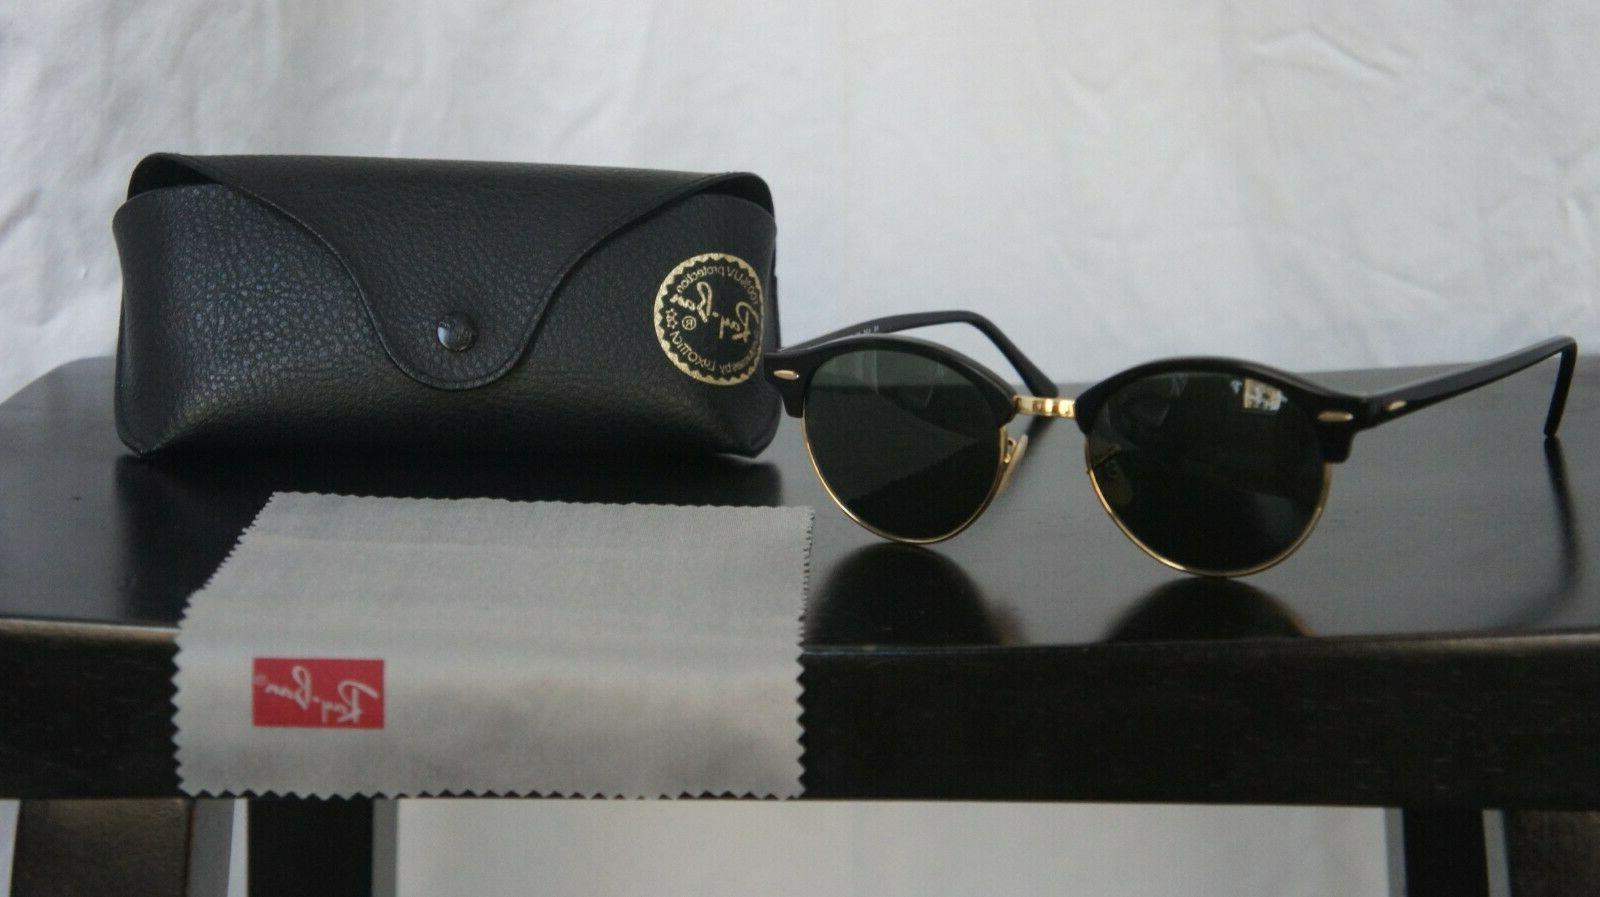 Ray-Ban Sunglasses ClubRound